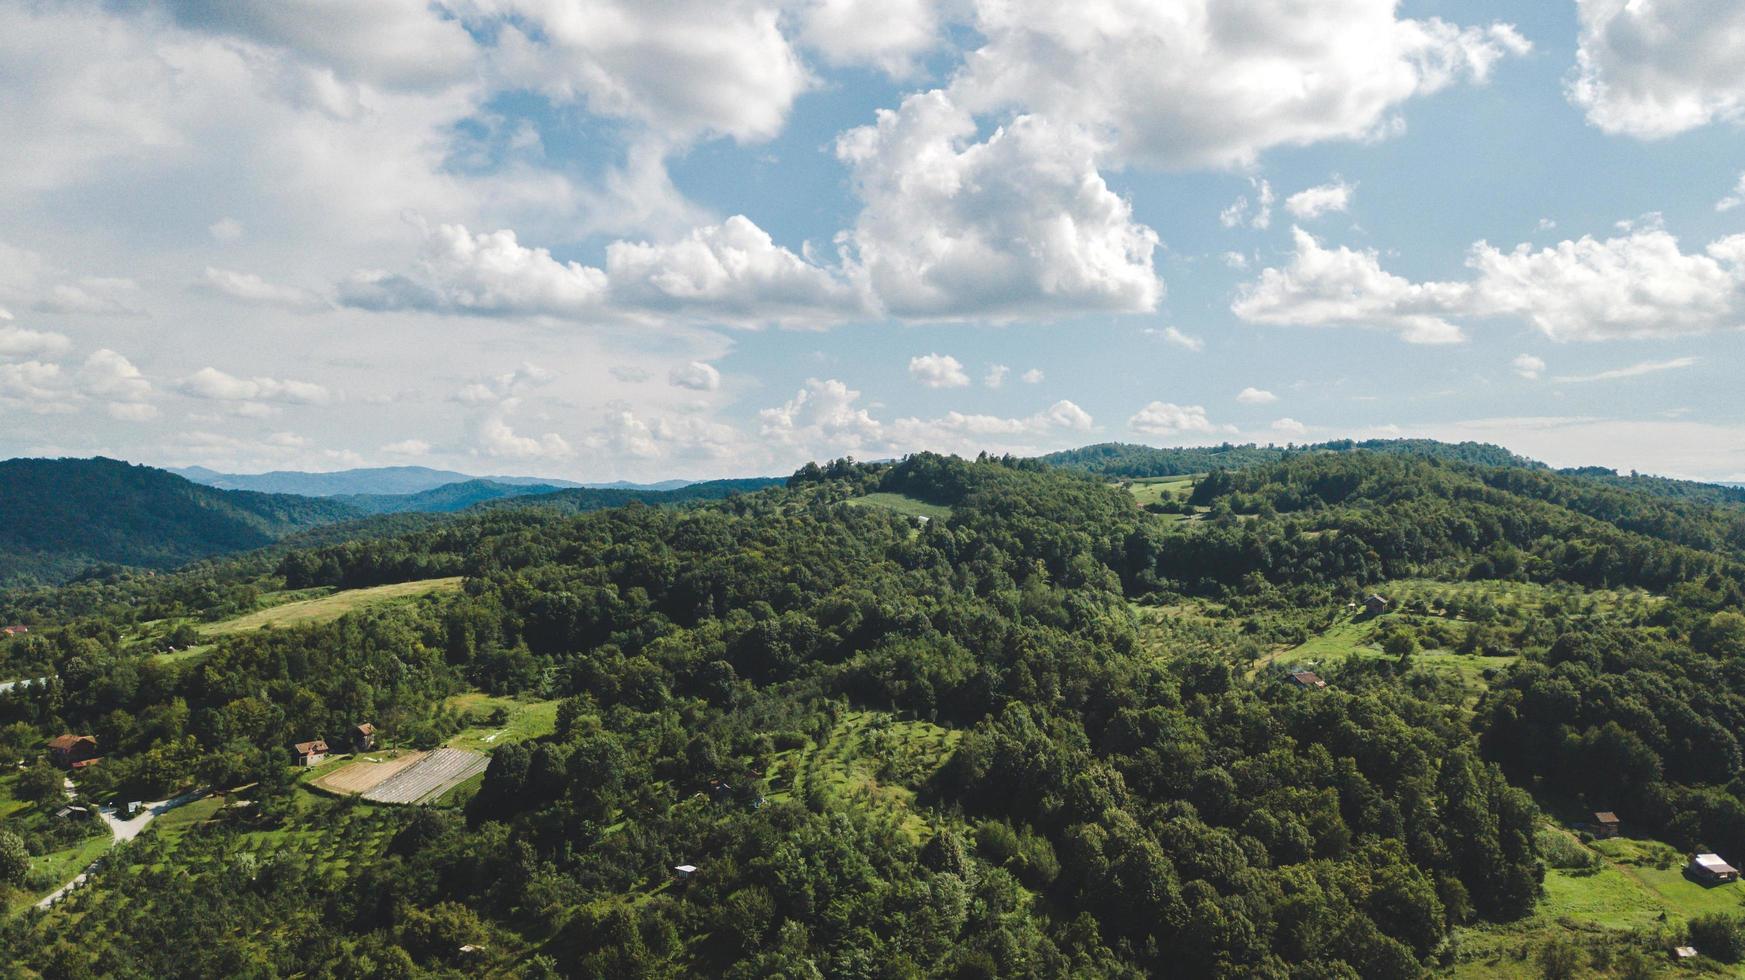 Aerial of farmland and cloudy blue sky photo